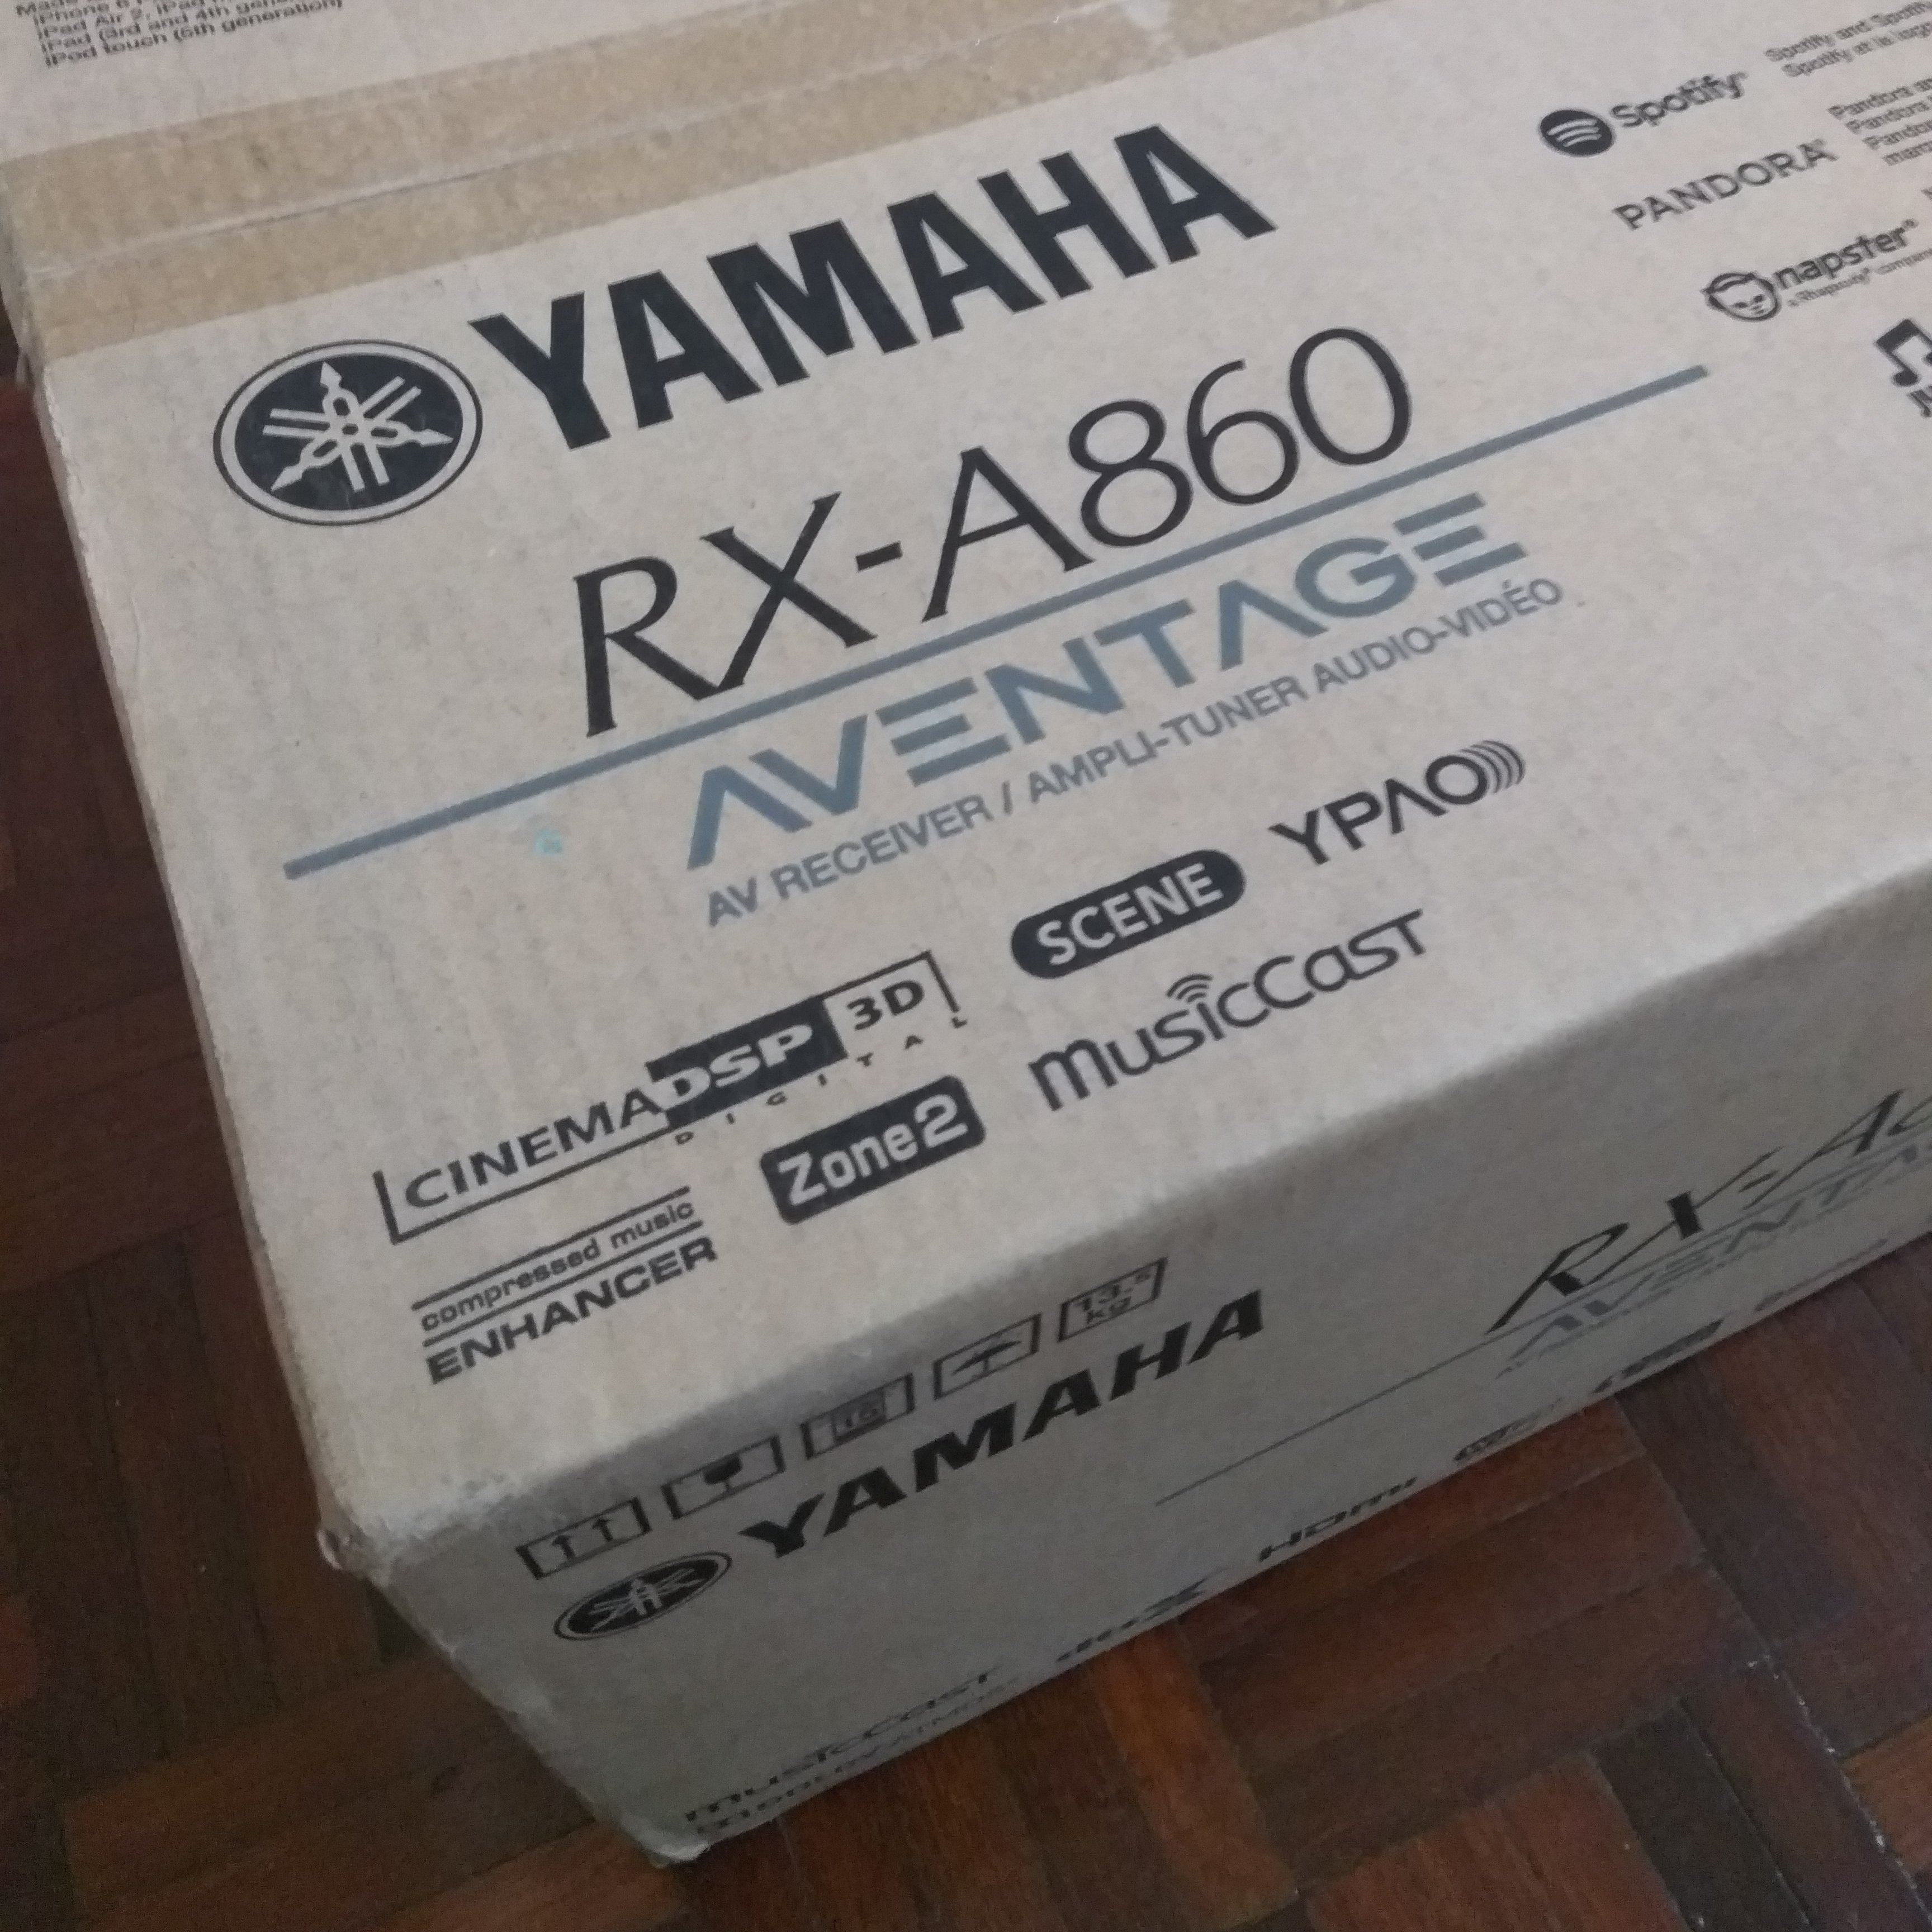 Yamaha RX-A860 is fun